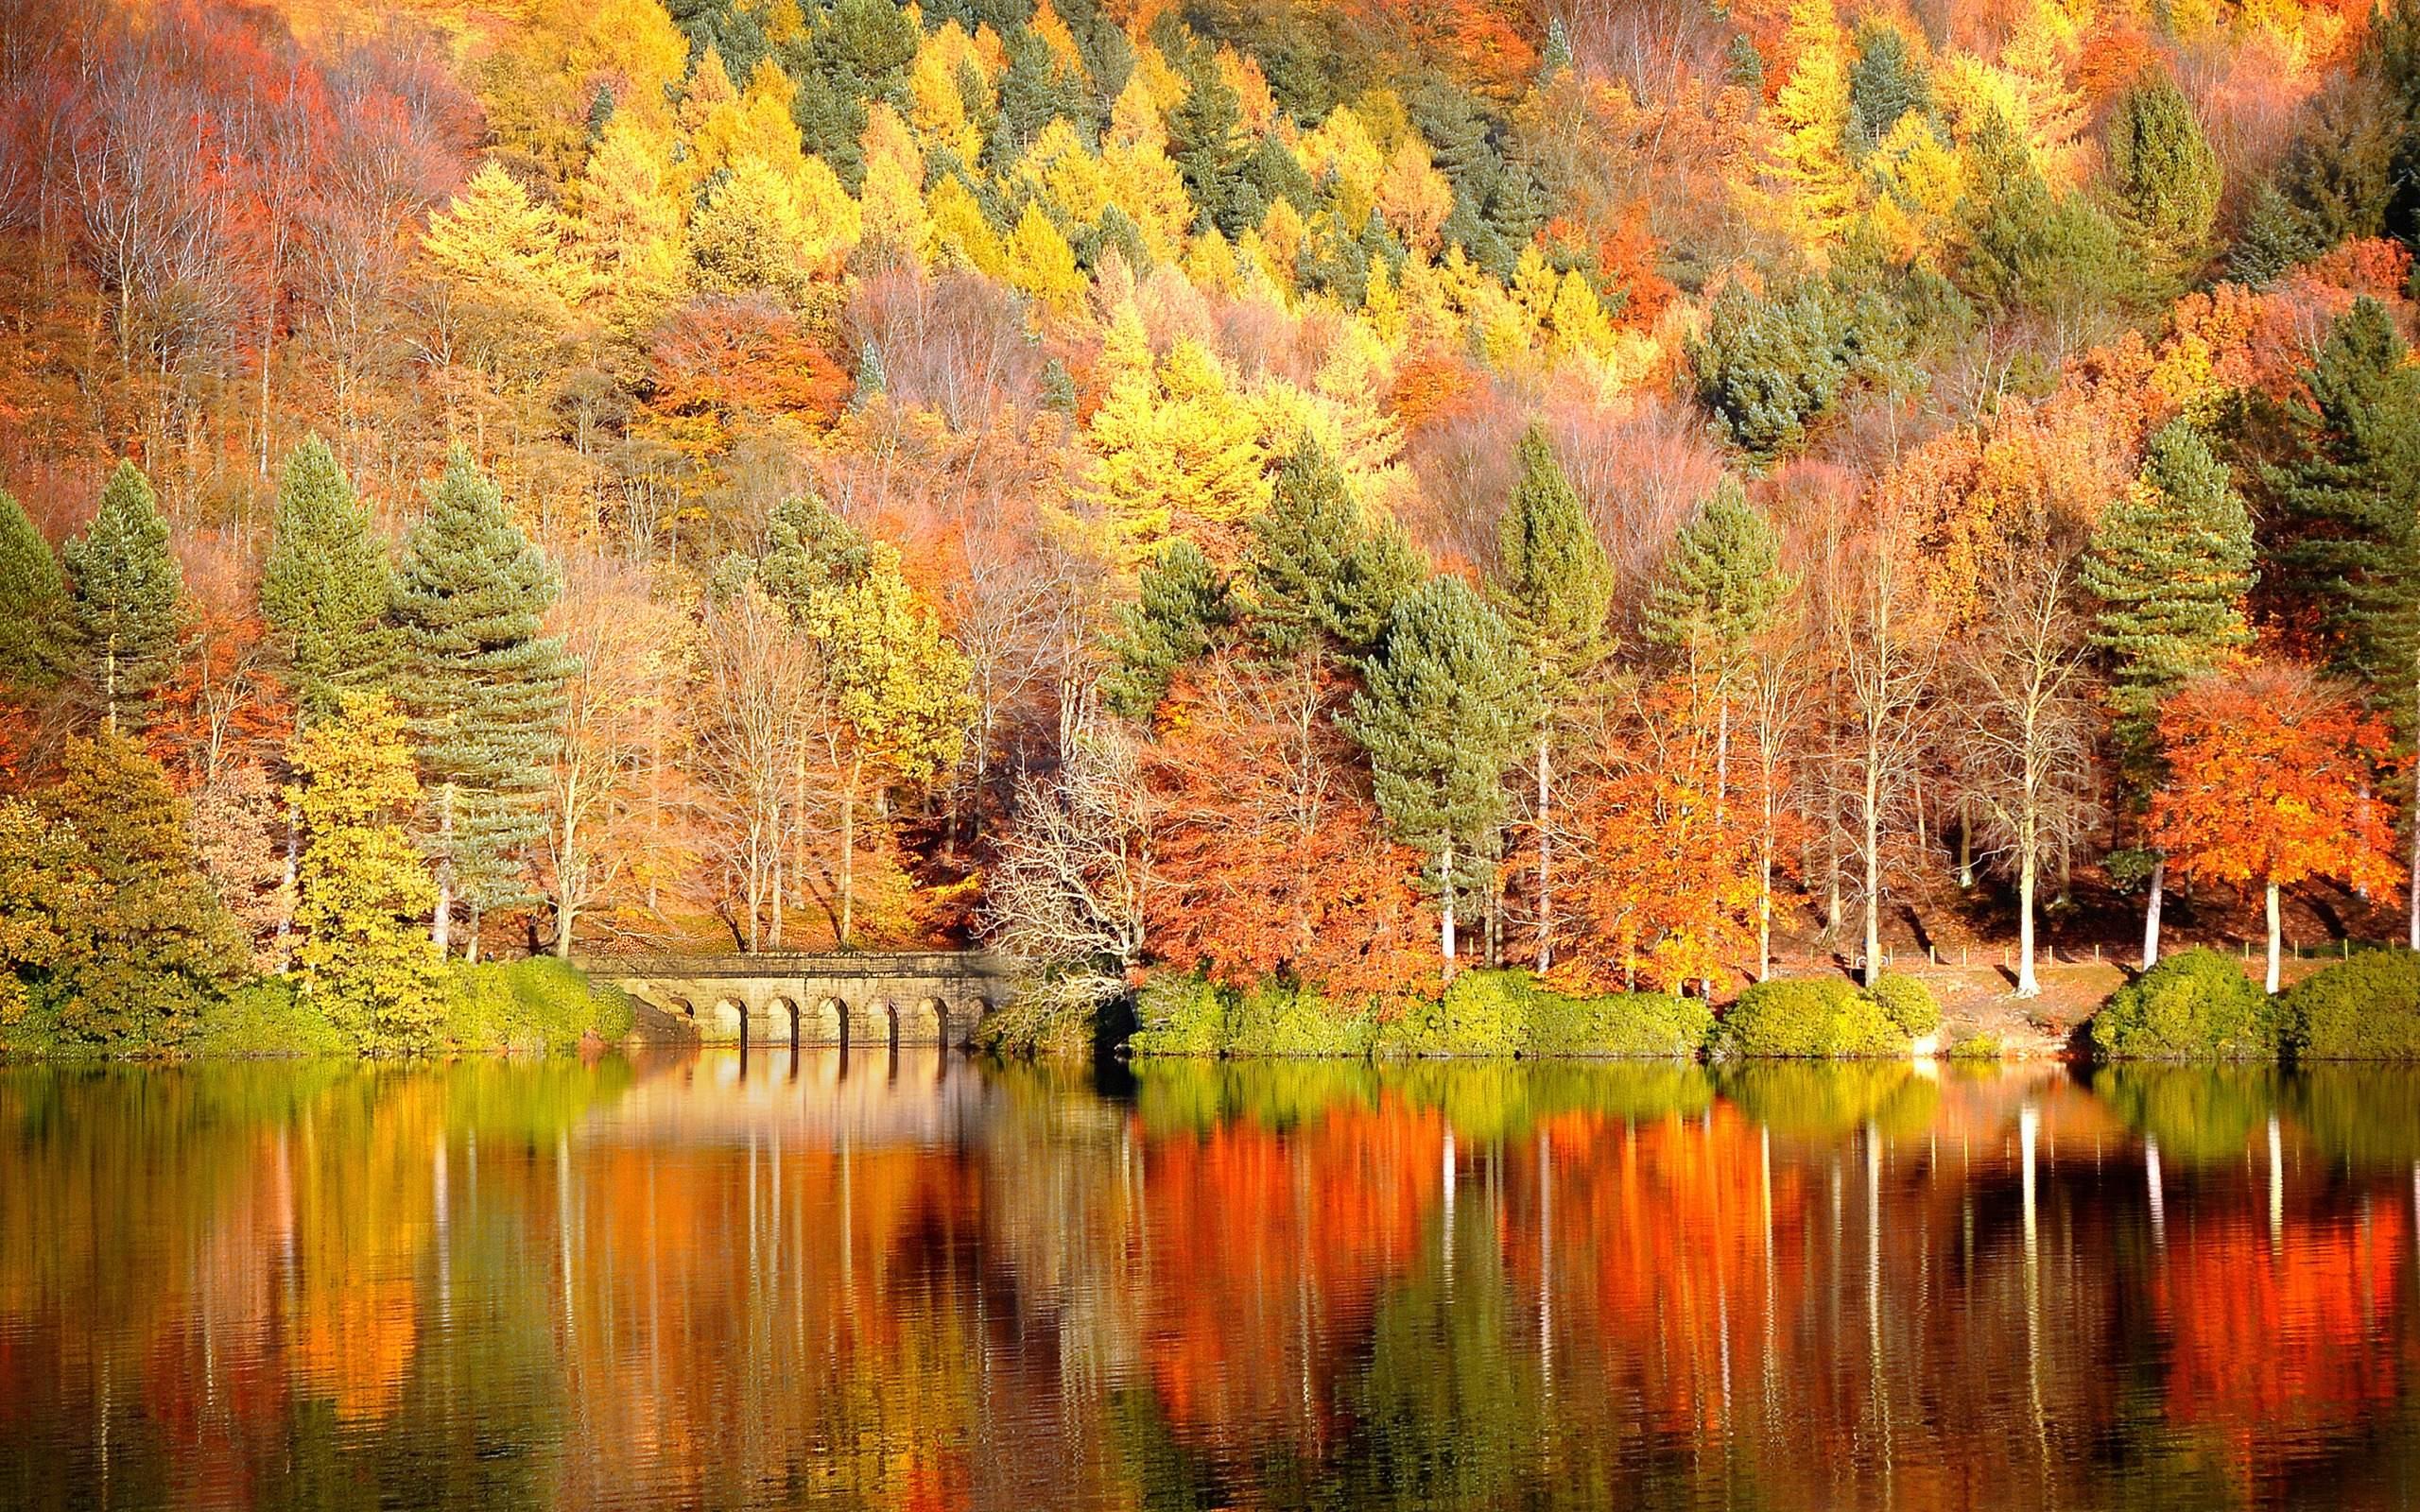 Fall Background - WallpaperSafari